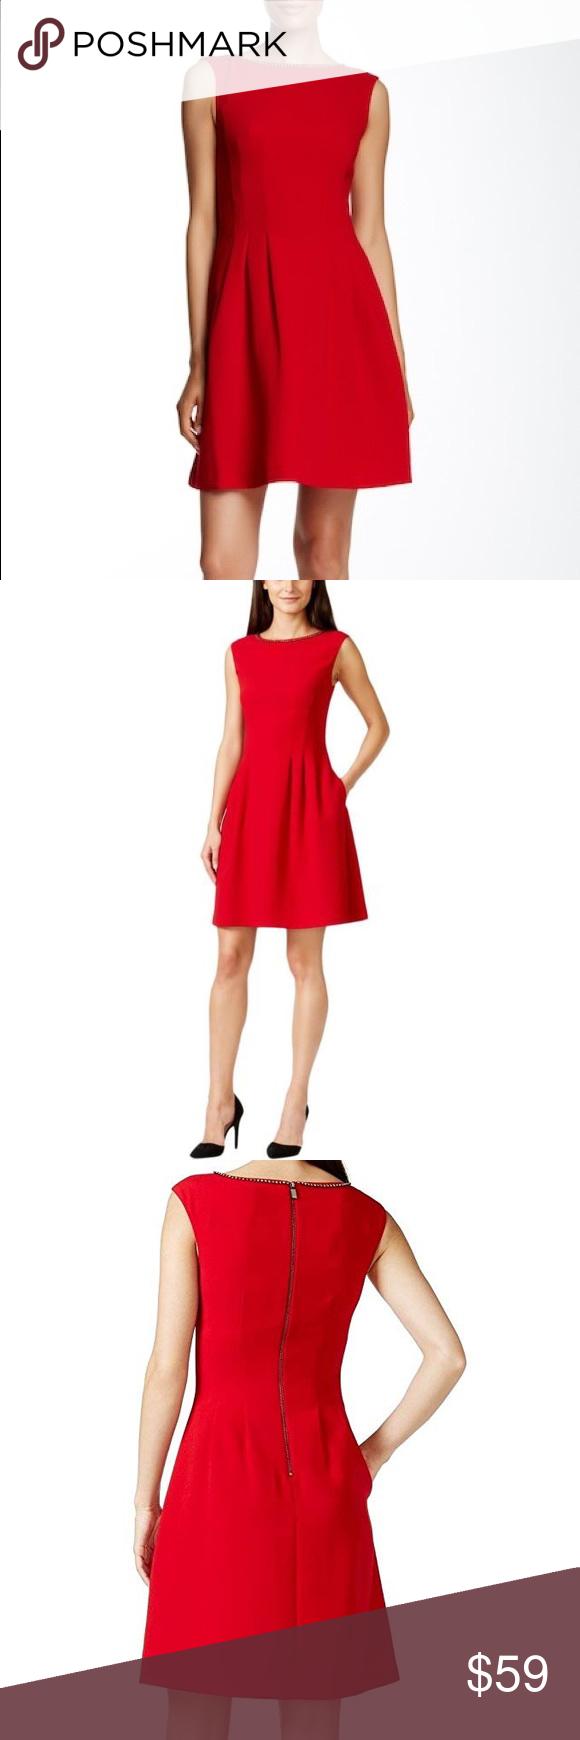 Nwt Vince Camuto Red Embellished Neck Dress Embellished Neck Dress Dresses Clothes Design [ 1740 x 580 Pixel ]